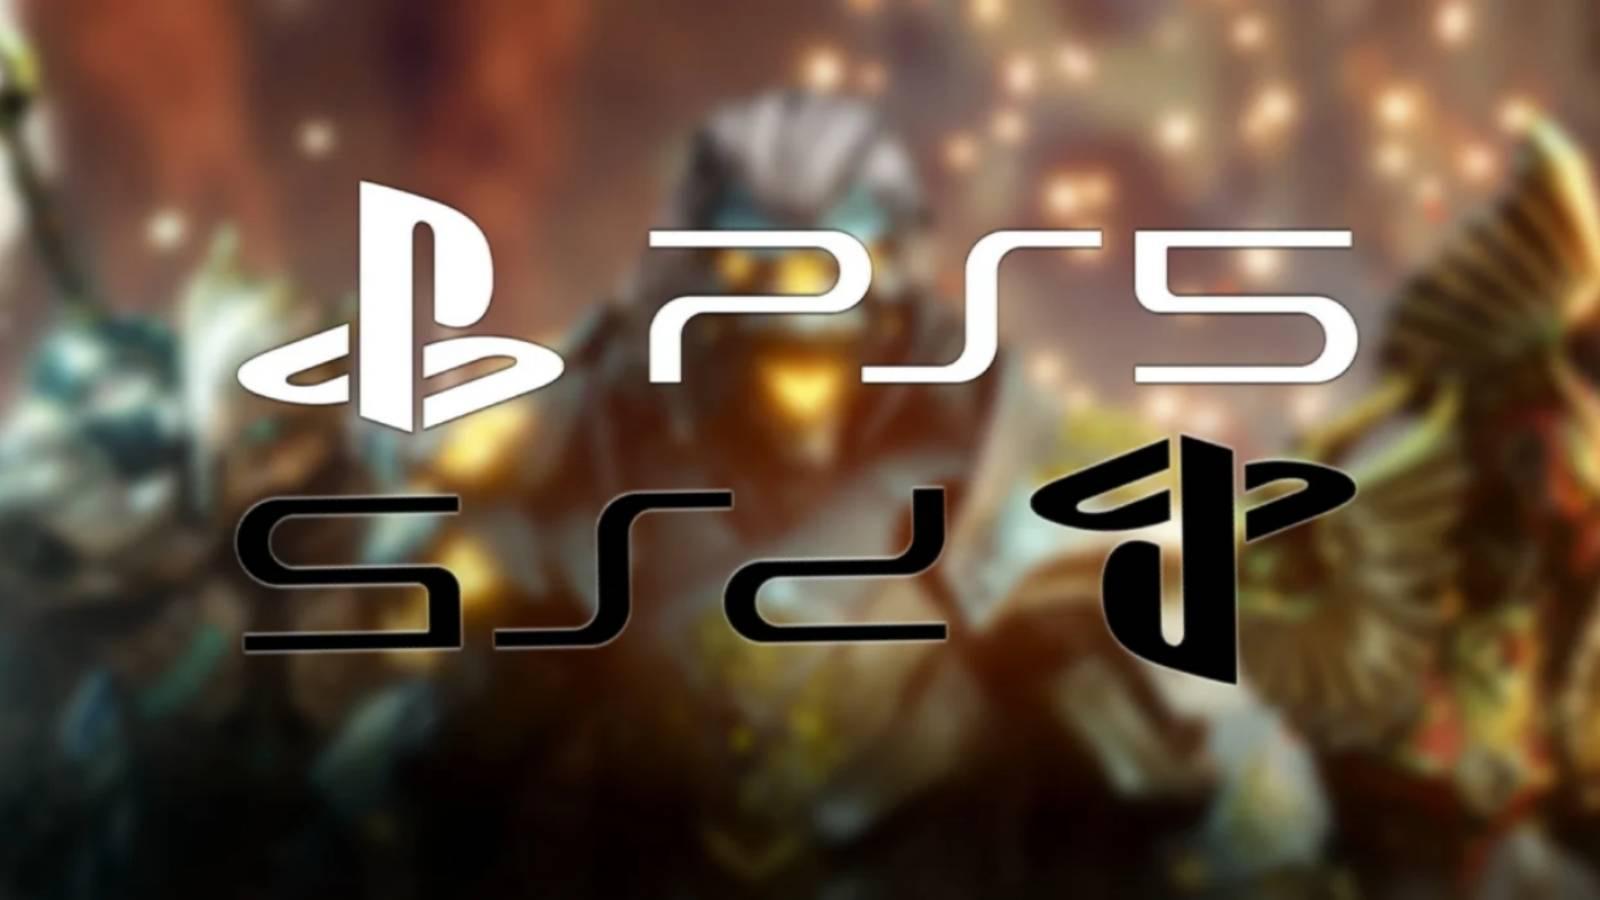 Playstation 5 modele